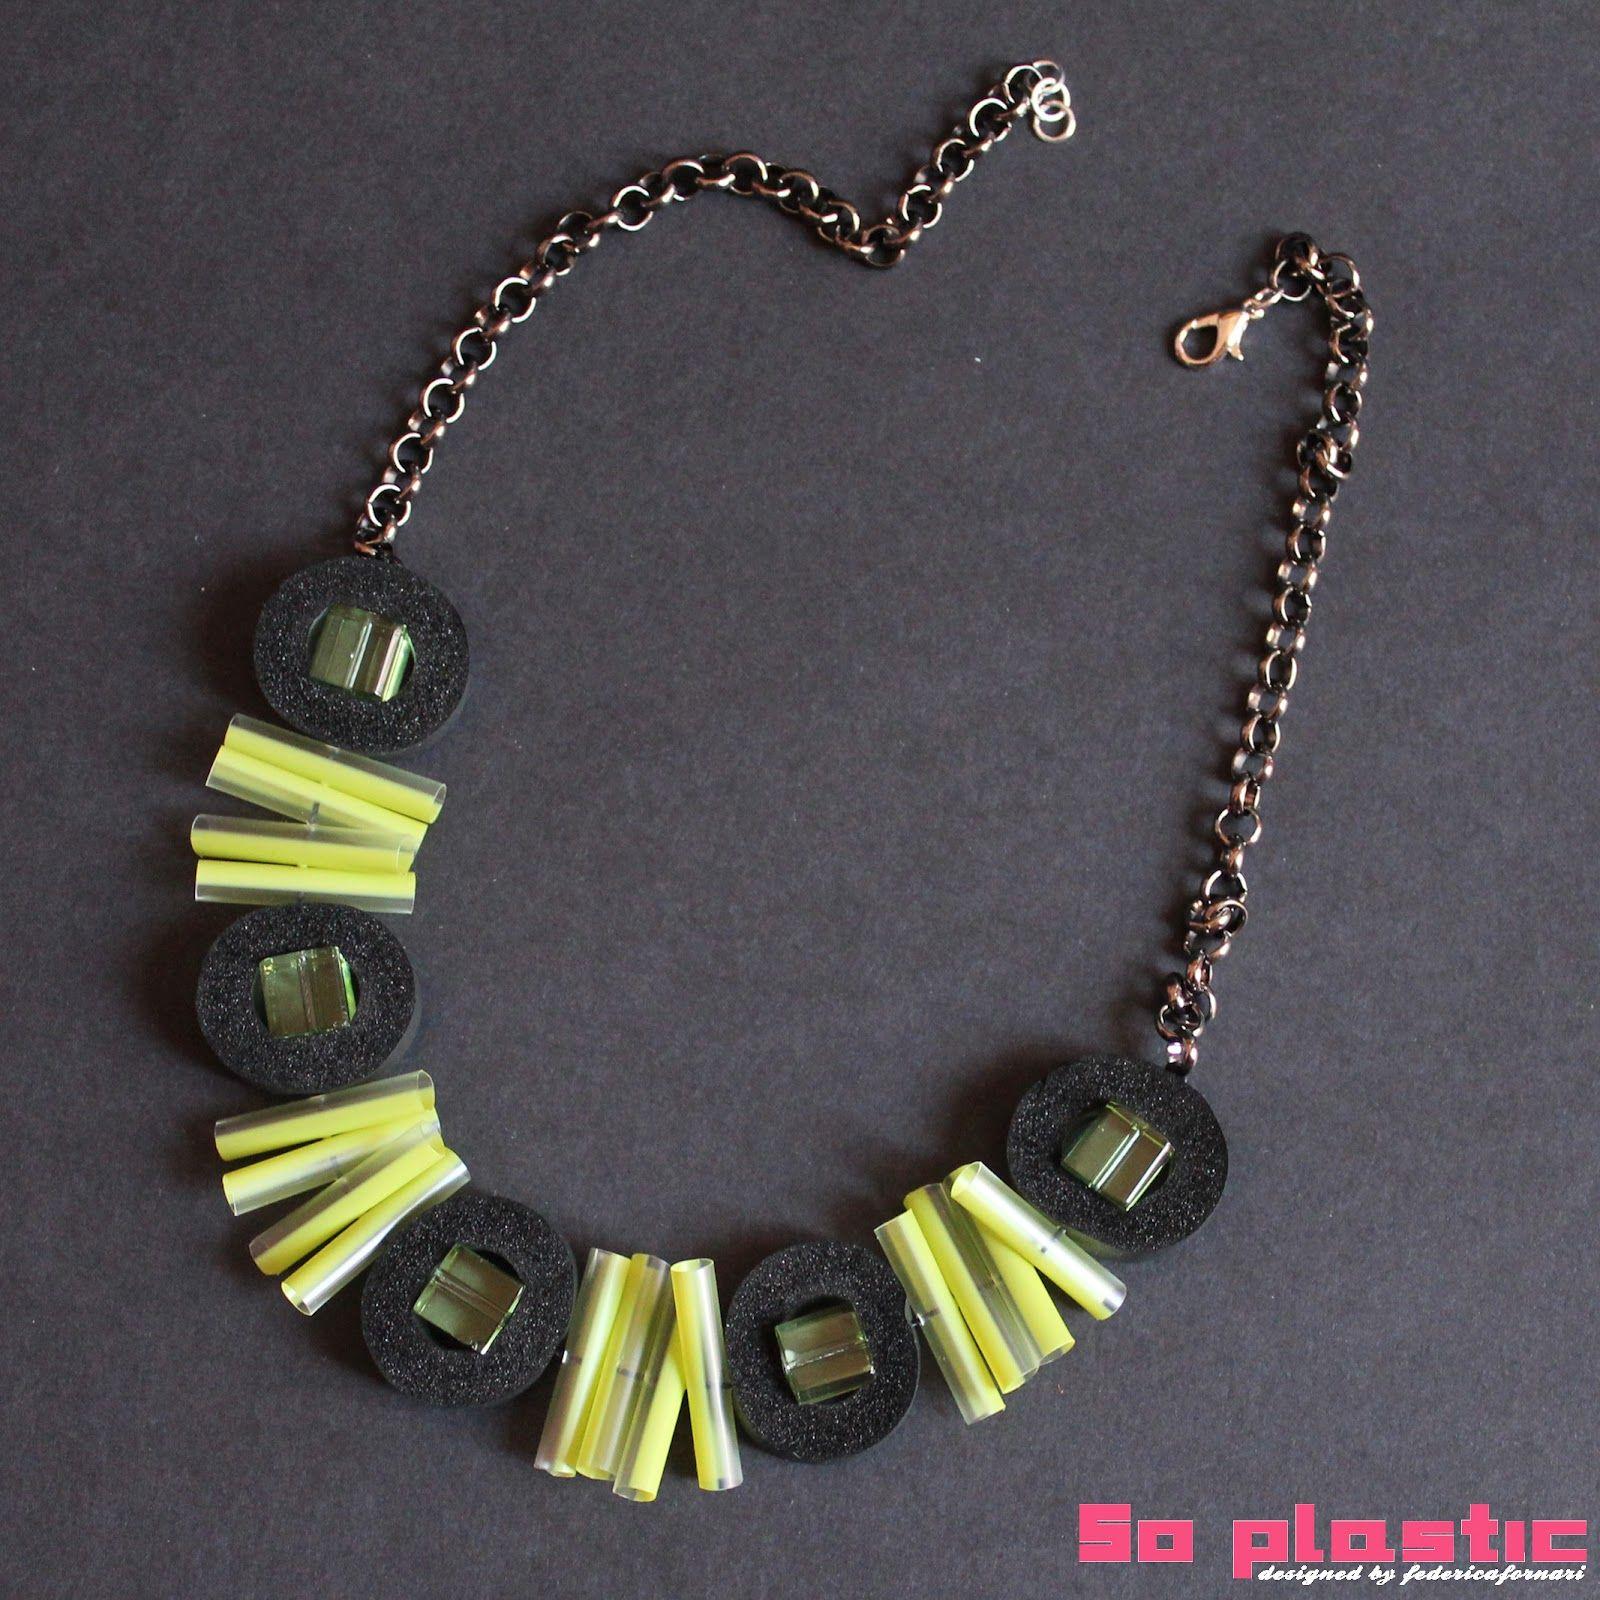 http://soplasticdesign.blogspot.it/  Jewelry Straws!